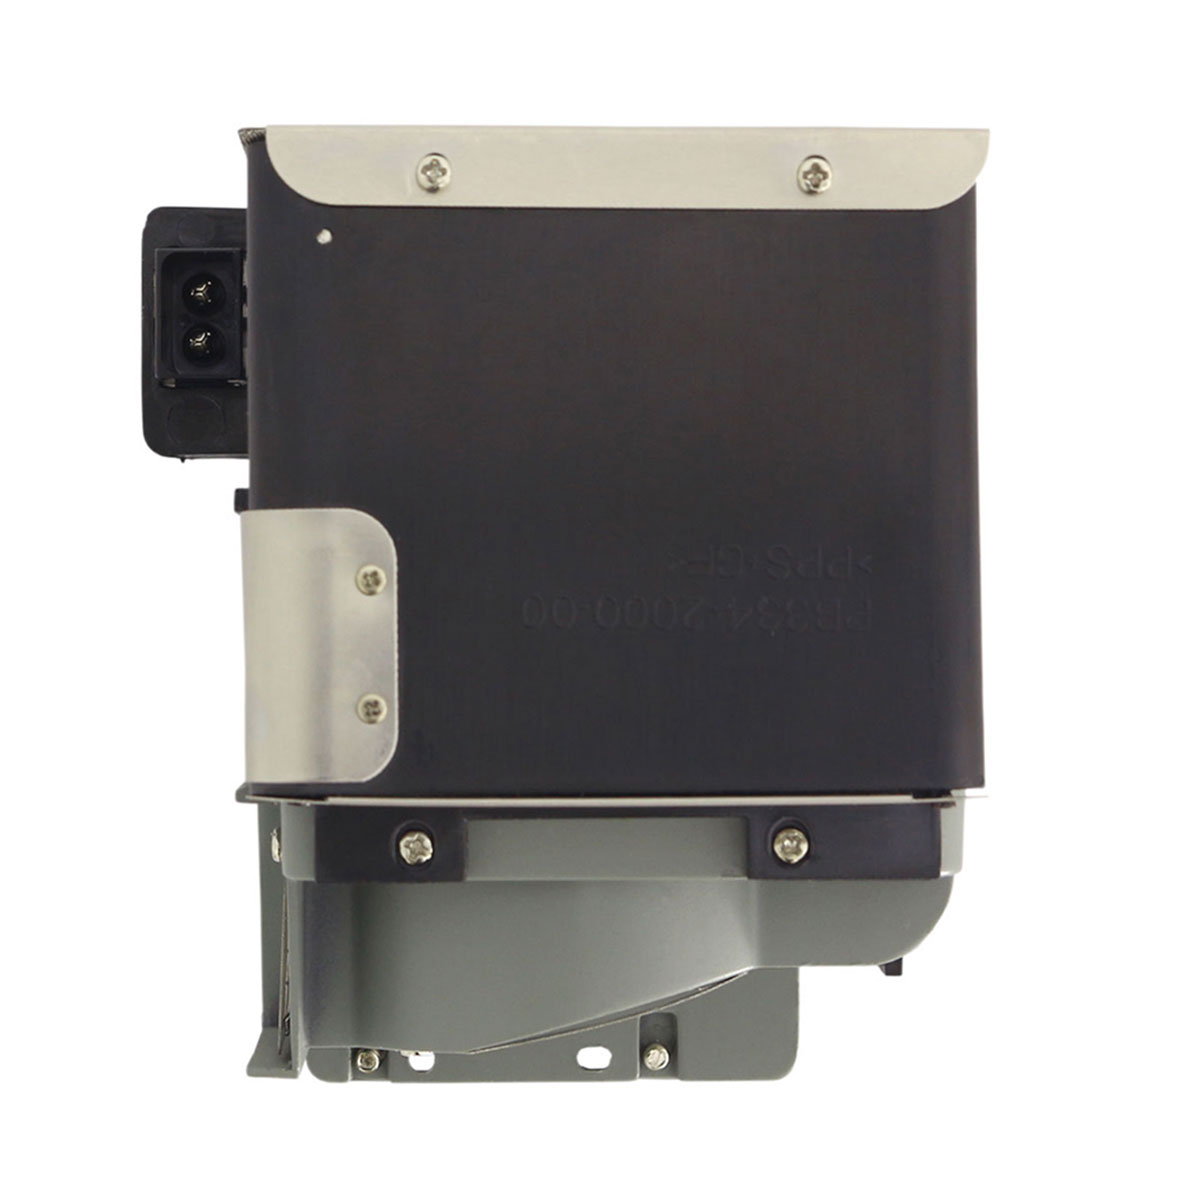 Mitsubishi Vlt Hc7800lp Vlthc7800lp Osram Projector Lamp